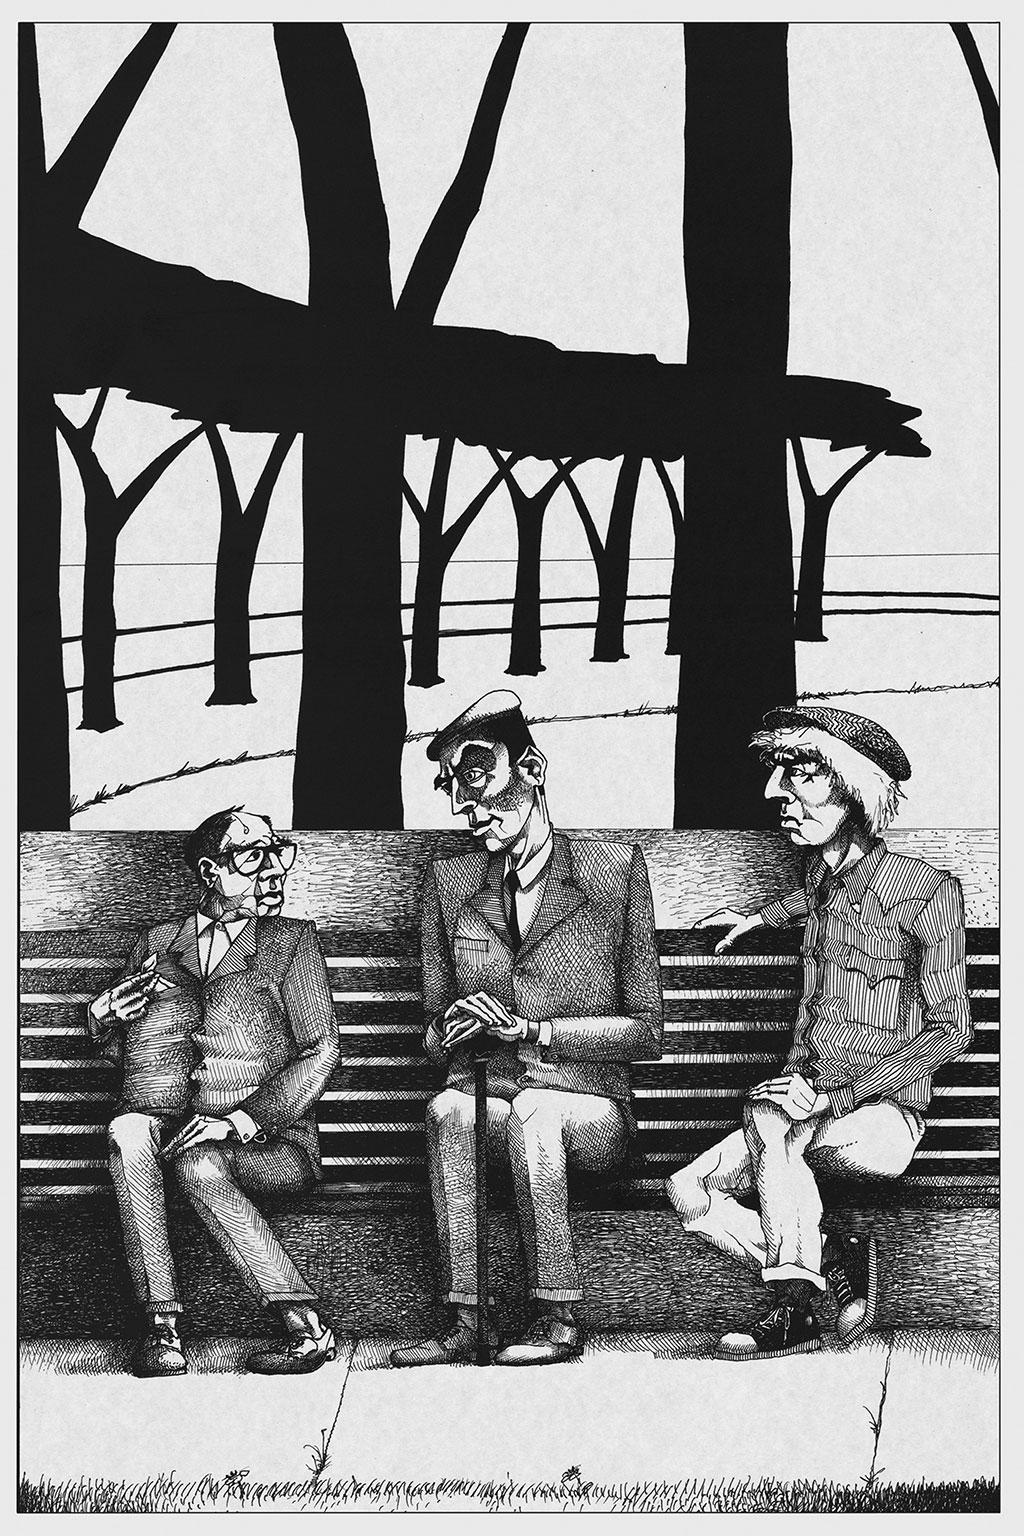 Иллюстрация Мастер и Маргарита Чарли Стоун 1